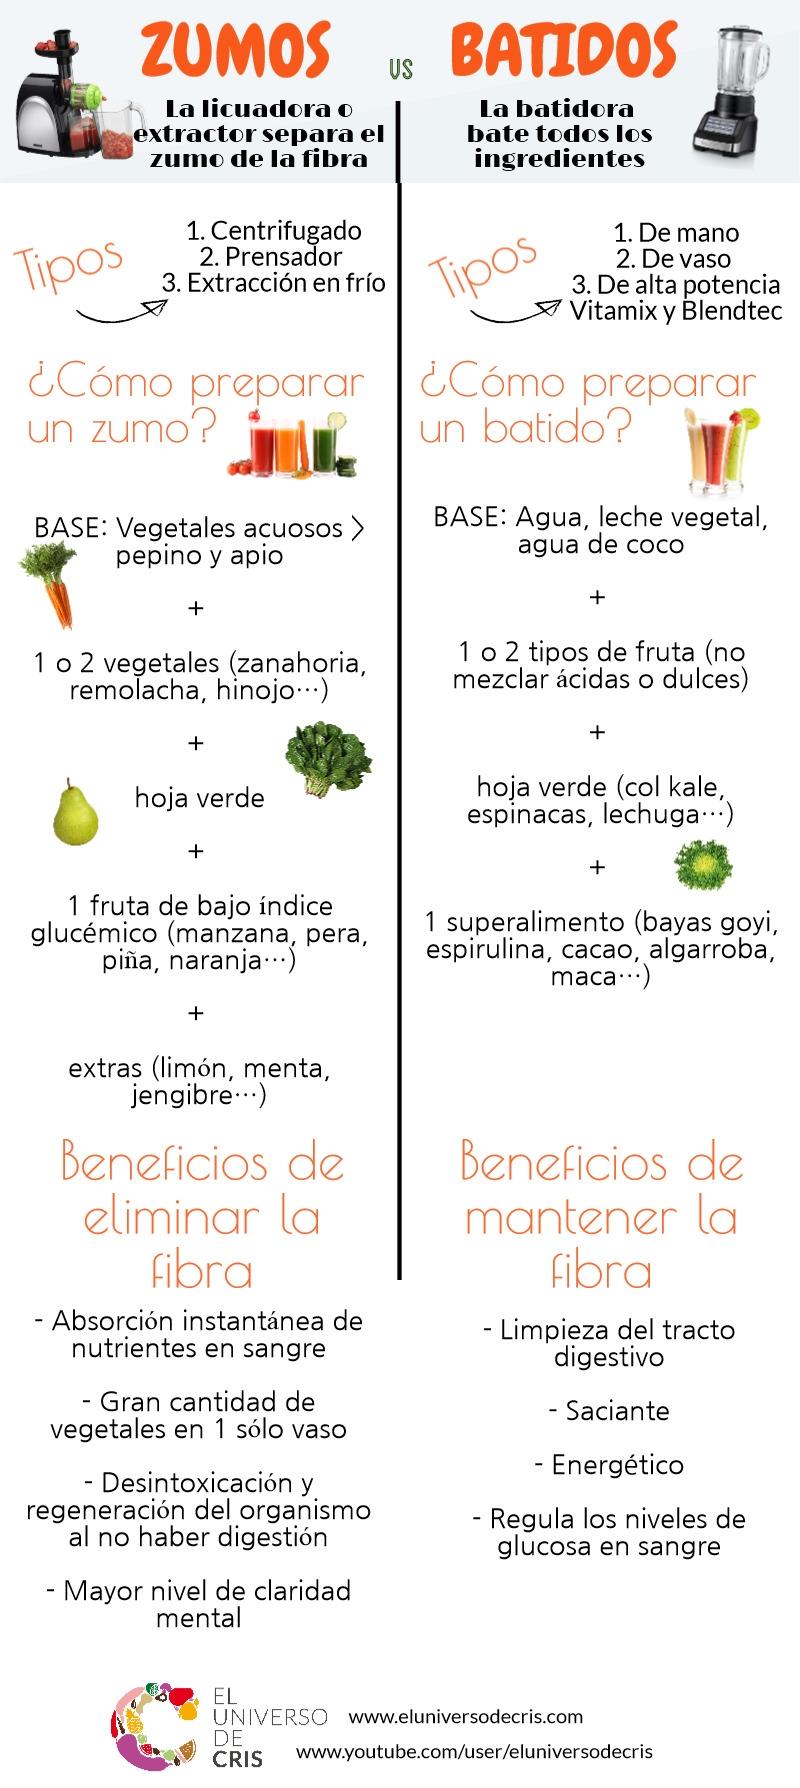 zumos vs batidos